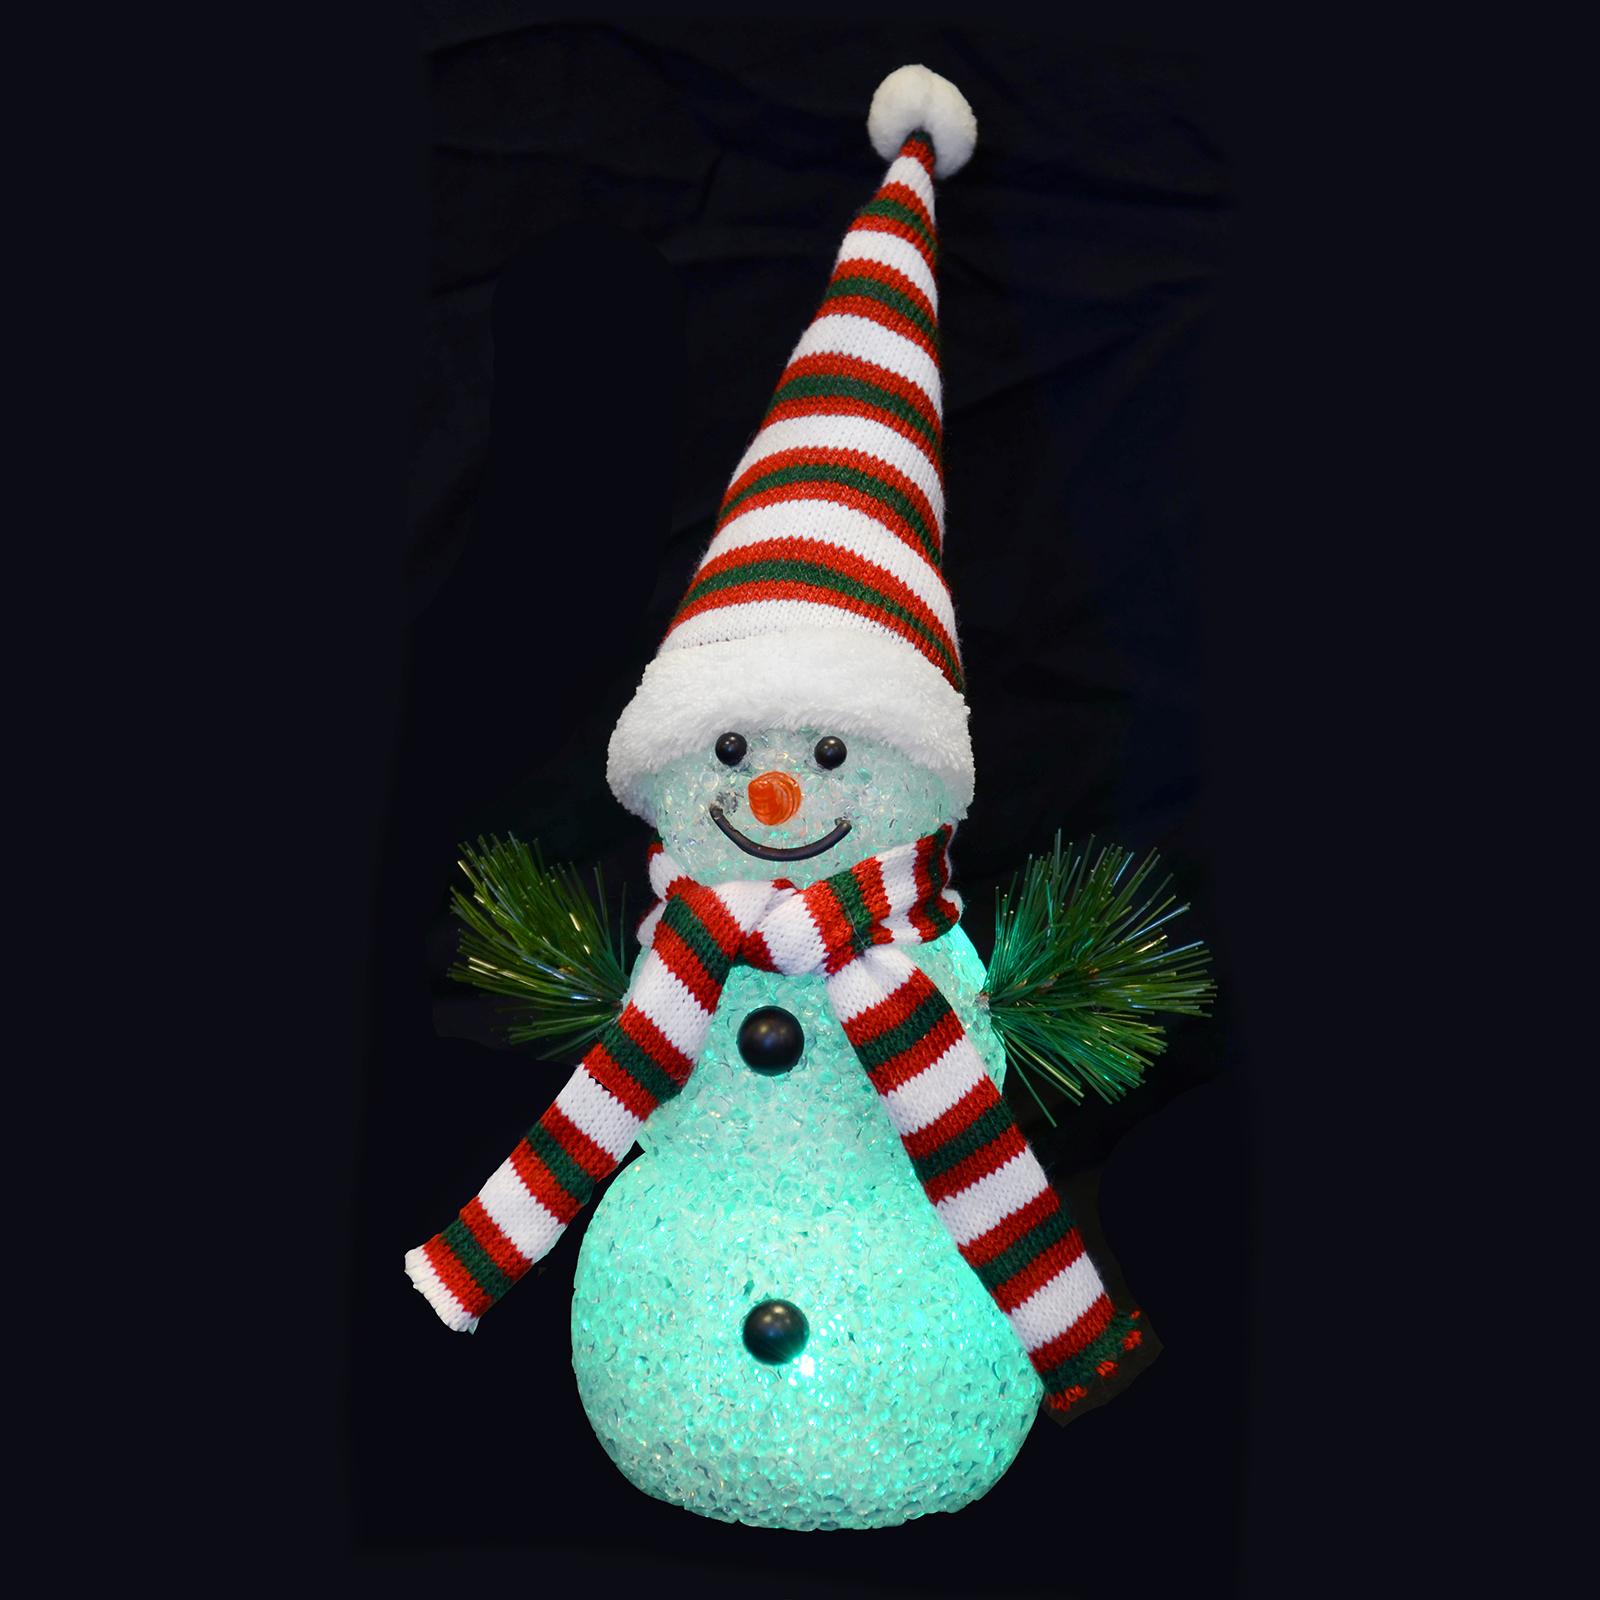 Light Up Parcels Christmas Decorations Argos: 18cm Light Up Snowman Colour Changing Multi LED Christmas